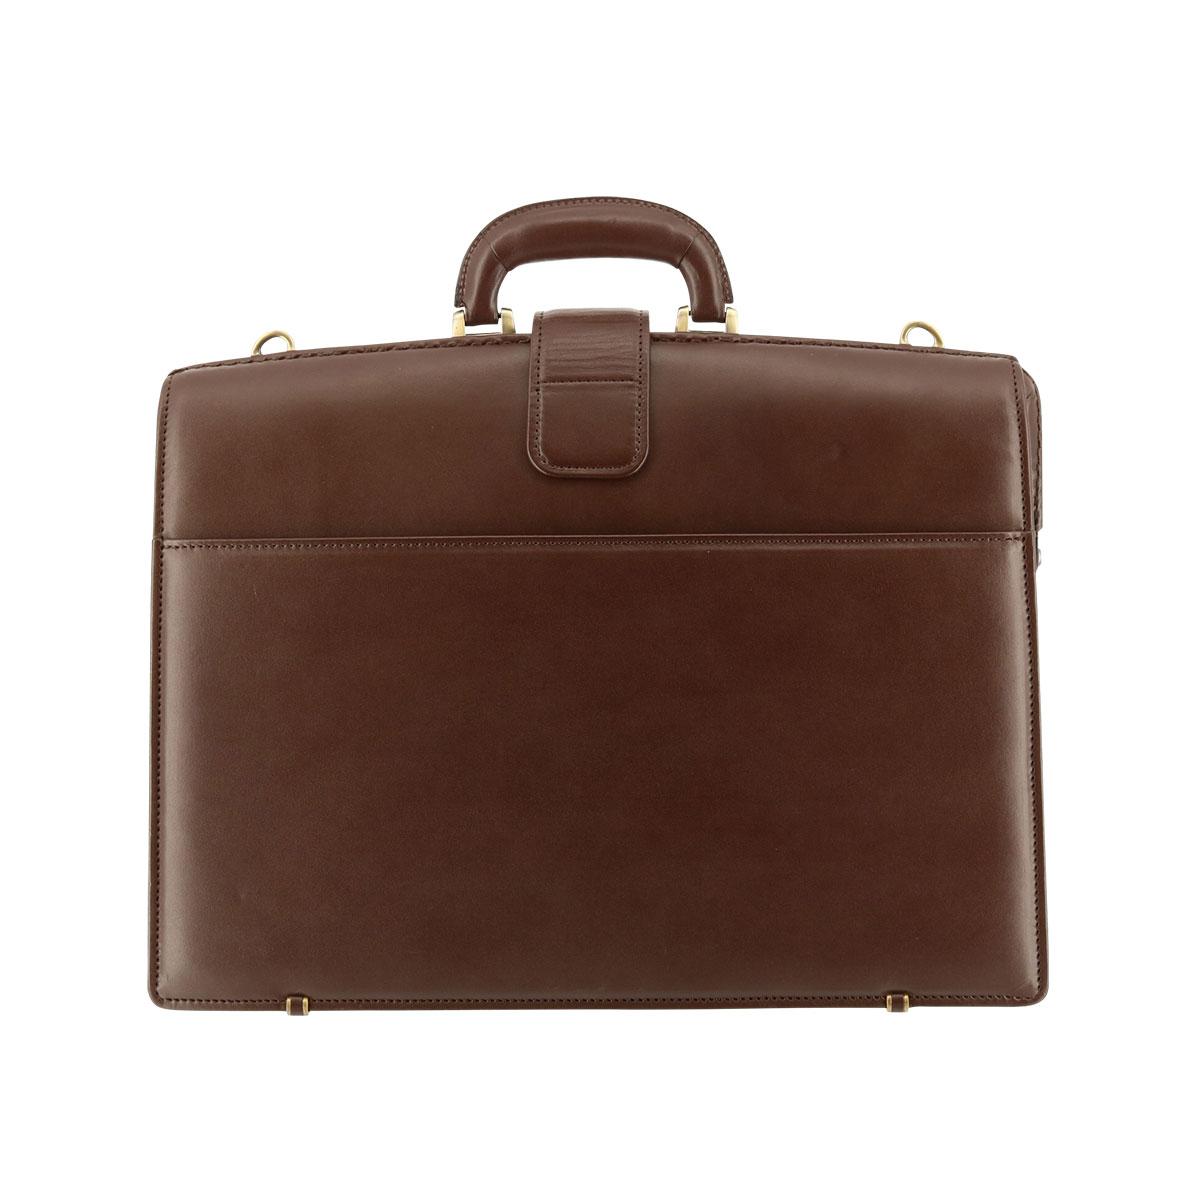 bf54aea36fd2 青木鞄 ラゲージアオキ1894 Luggage AOKI 1894 ブリーフケース 2558 ...